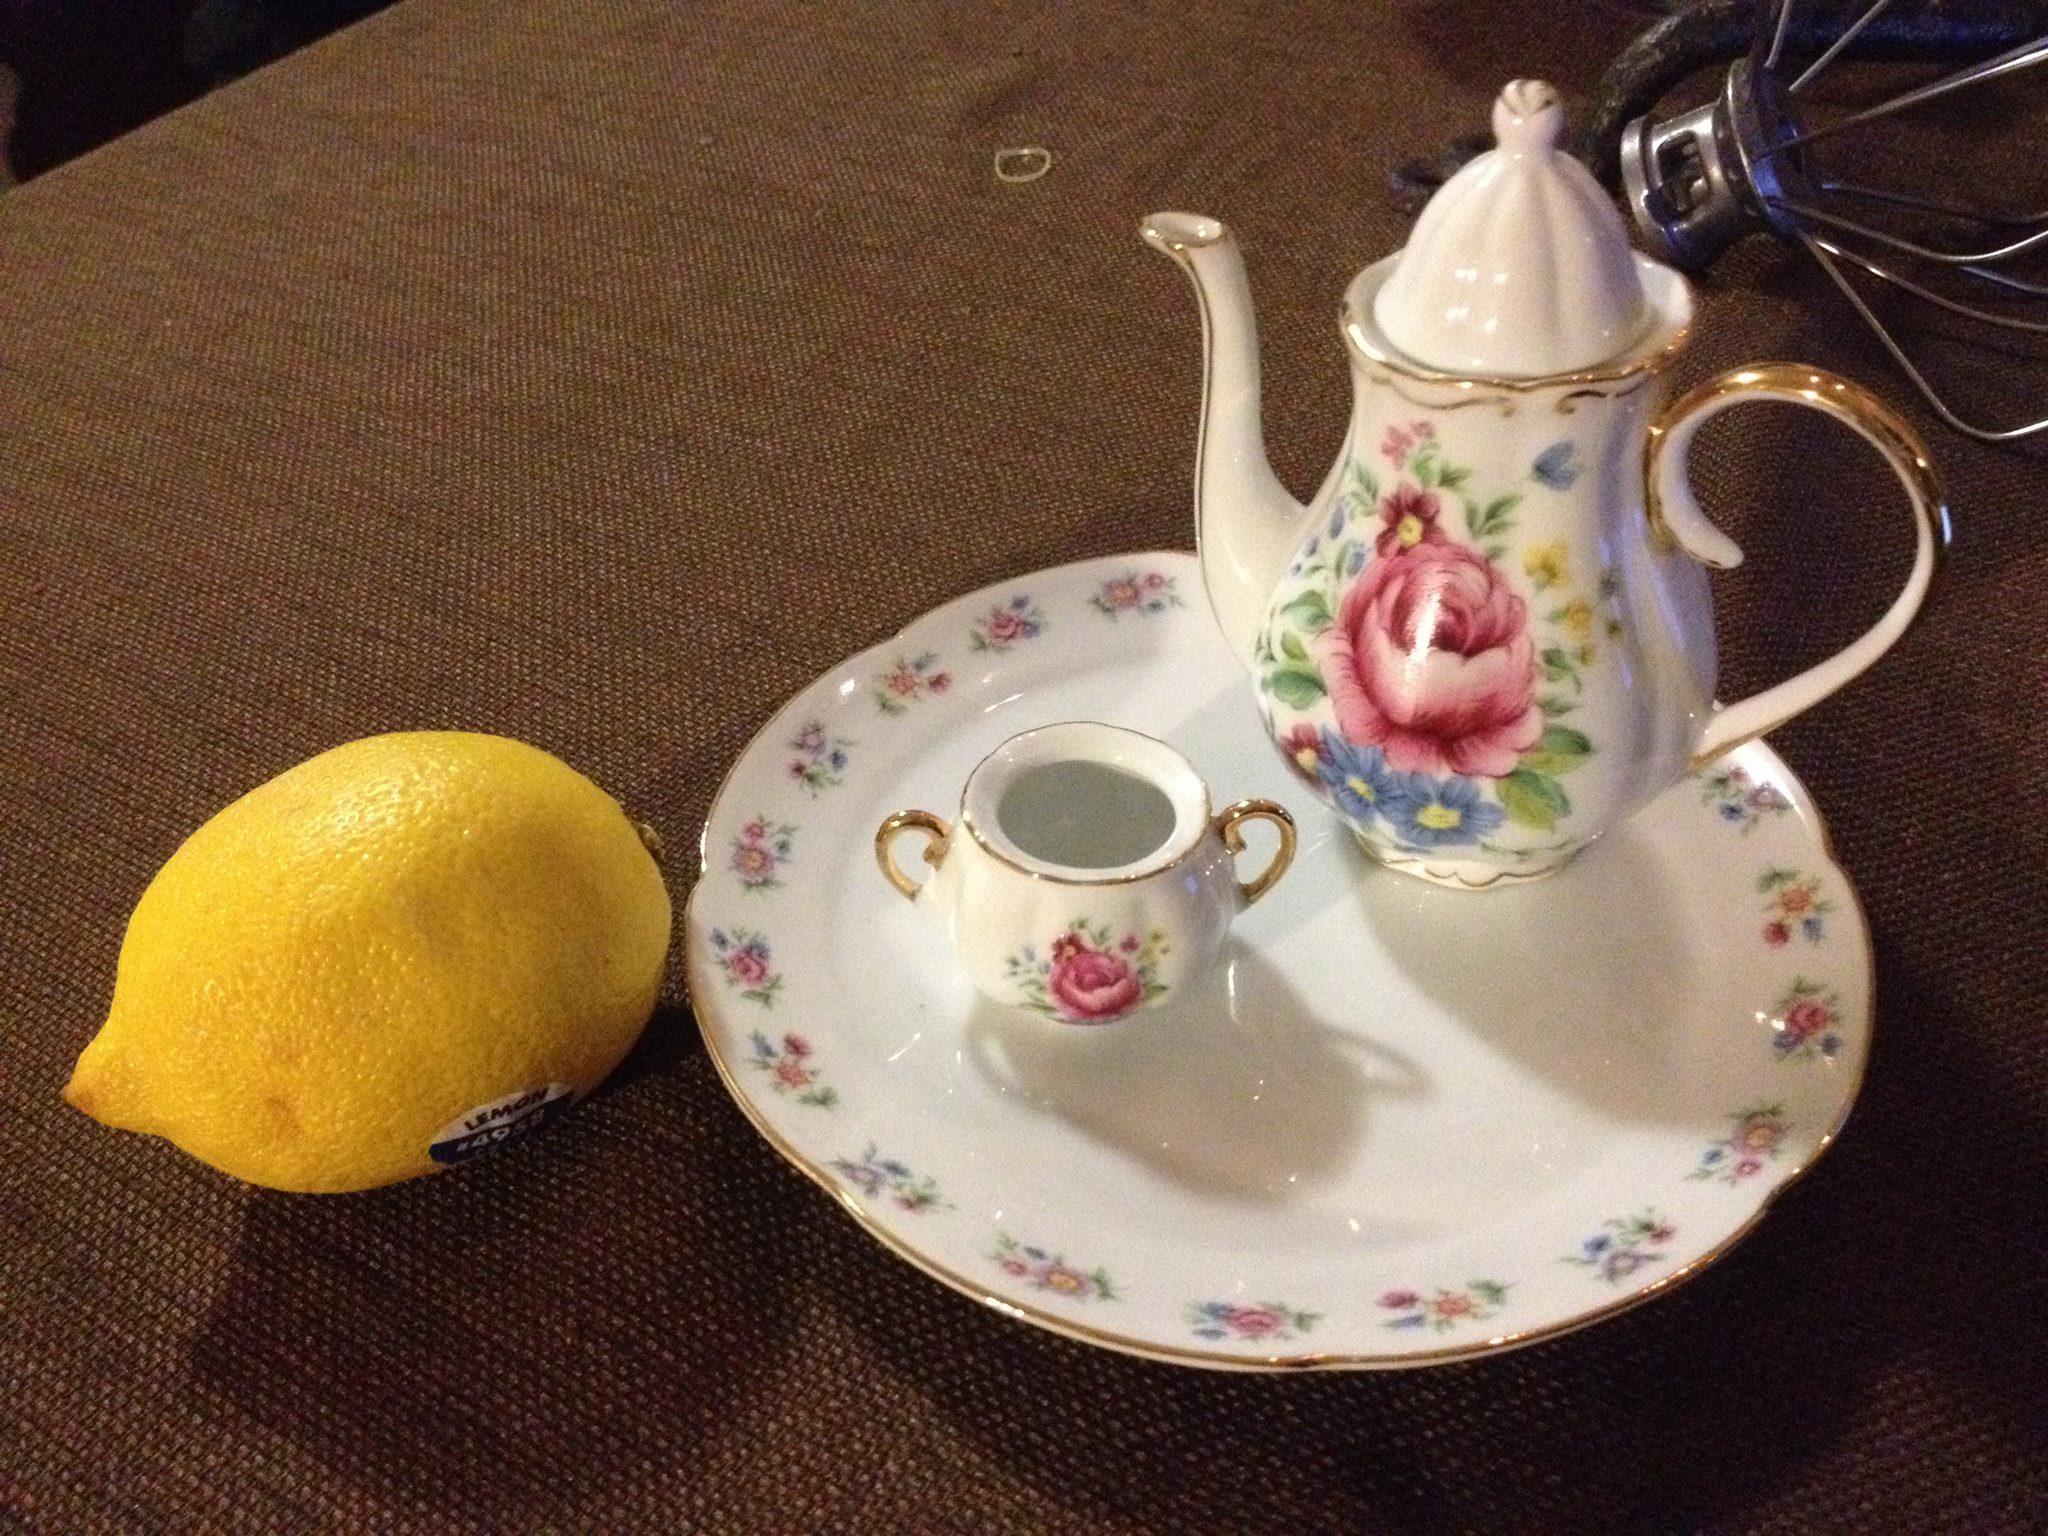 Child's Toy China Tea Set - Victoria's Garden: 20,600 ppm Lead